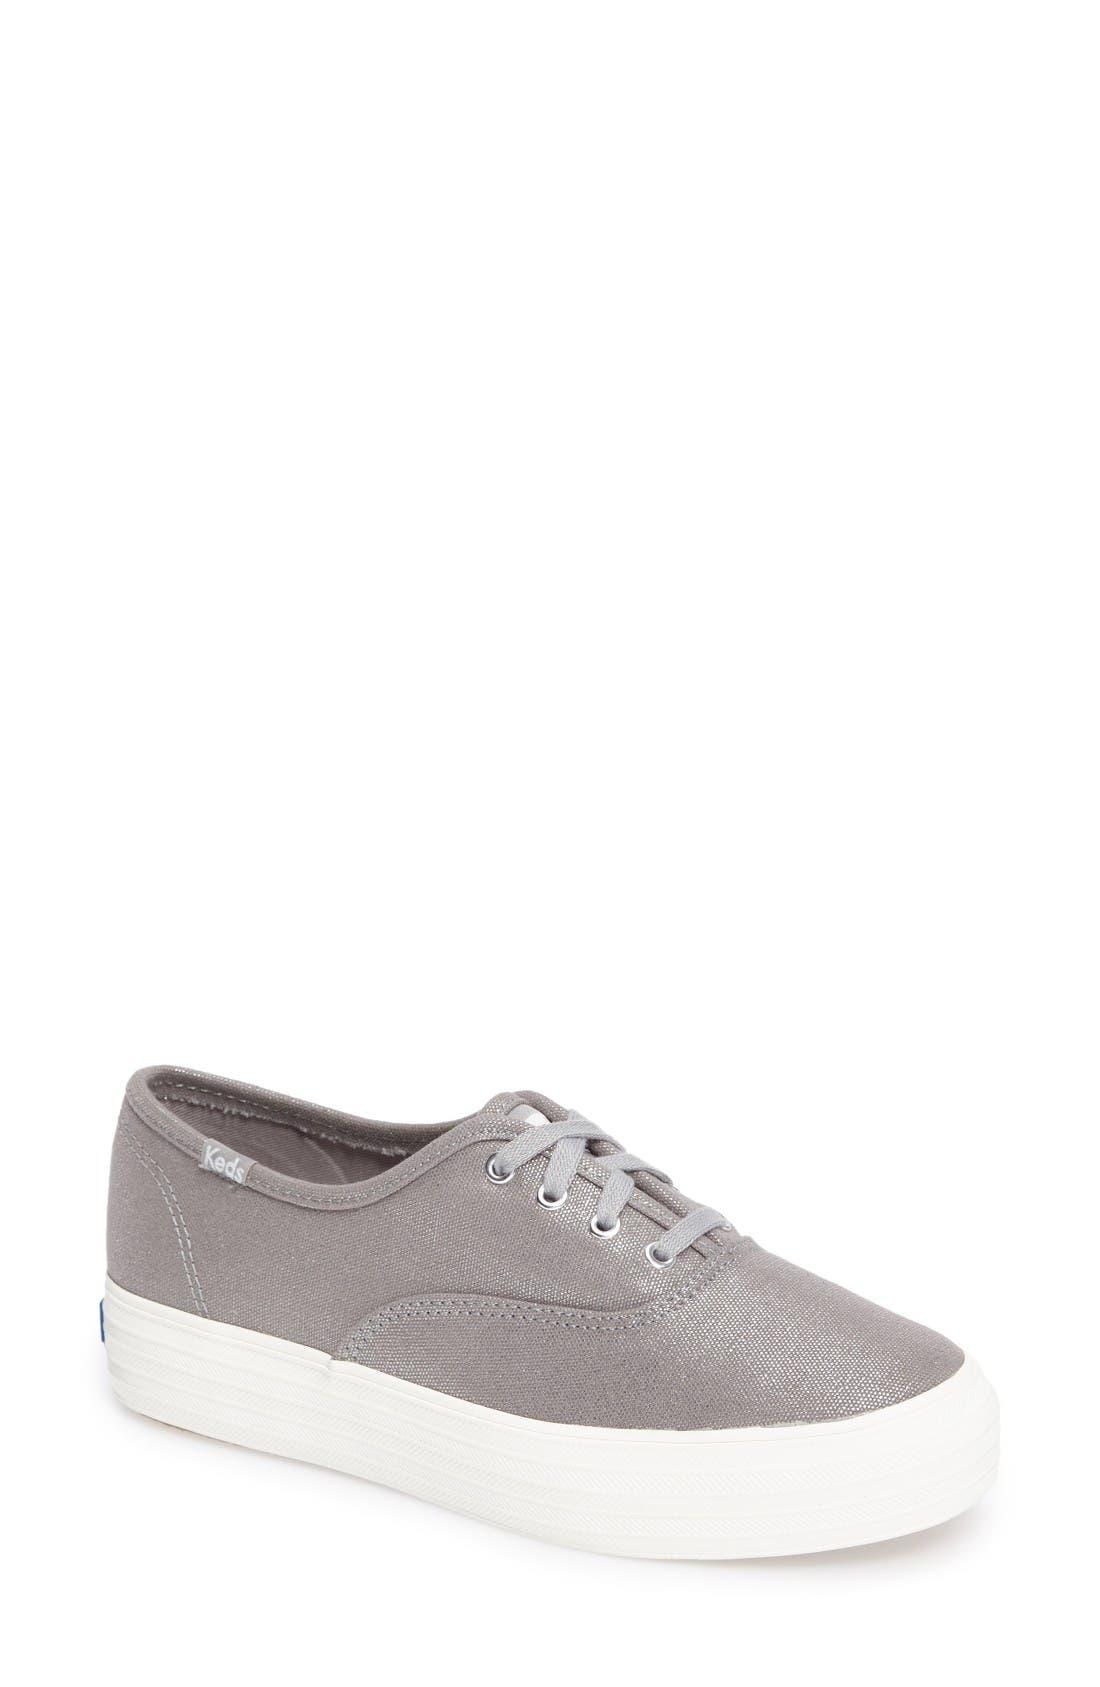 Alternate Image 1 Selected - Keds® Triple Deck Platform Sneaker (Women)